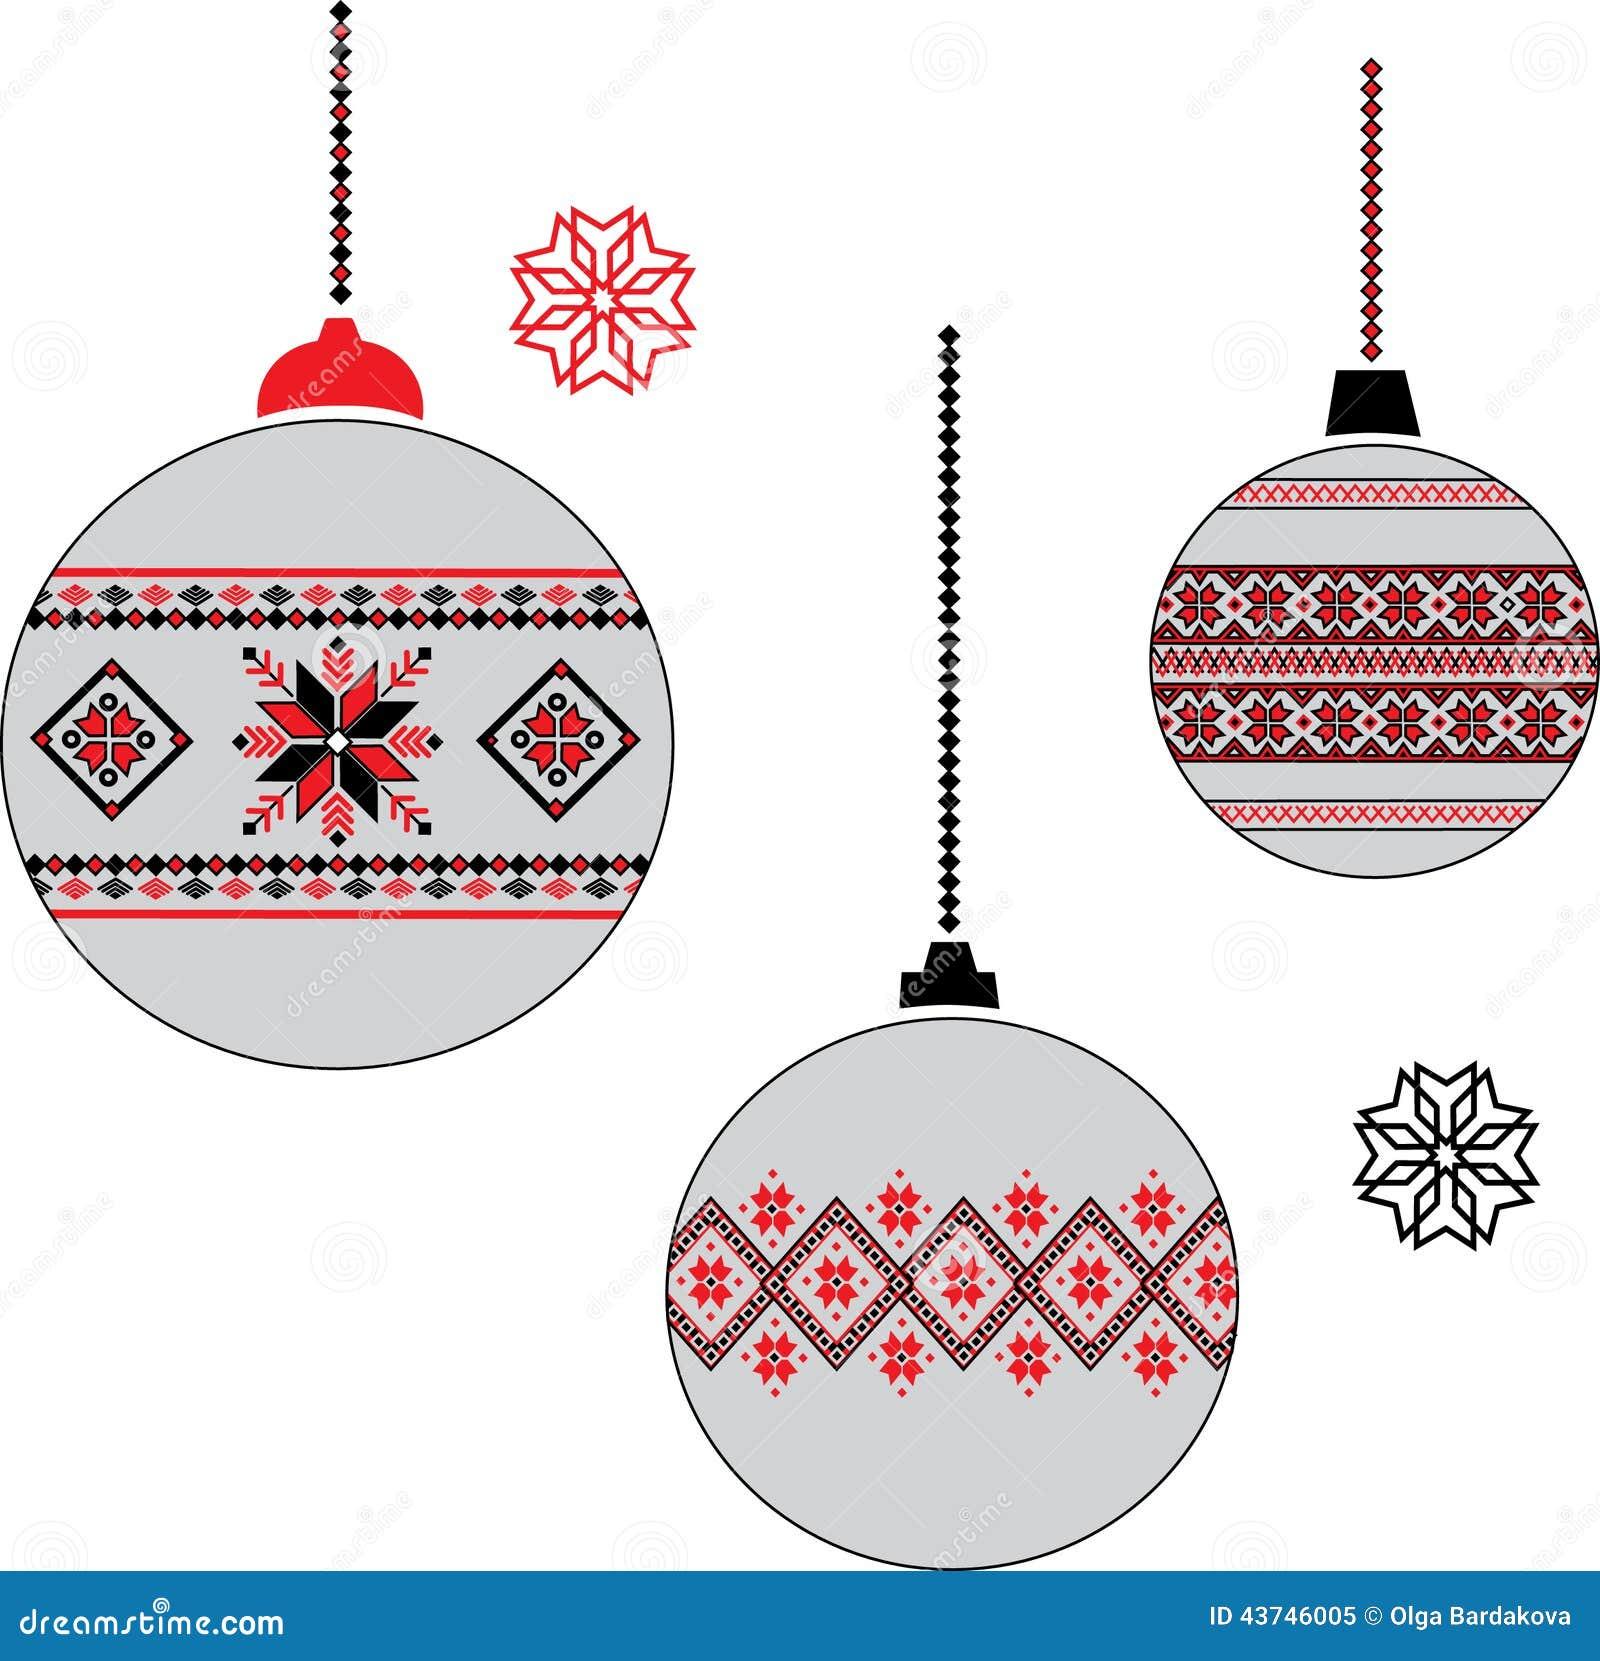 Ukrainian Christmas Ball Stock Photo - Image: 43746005